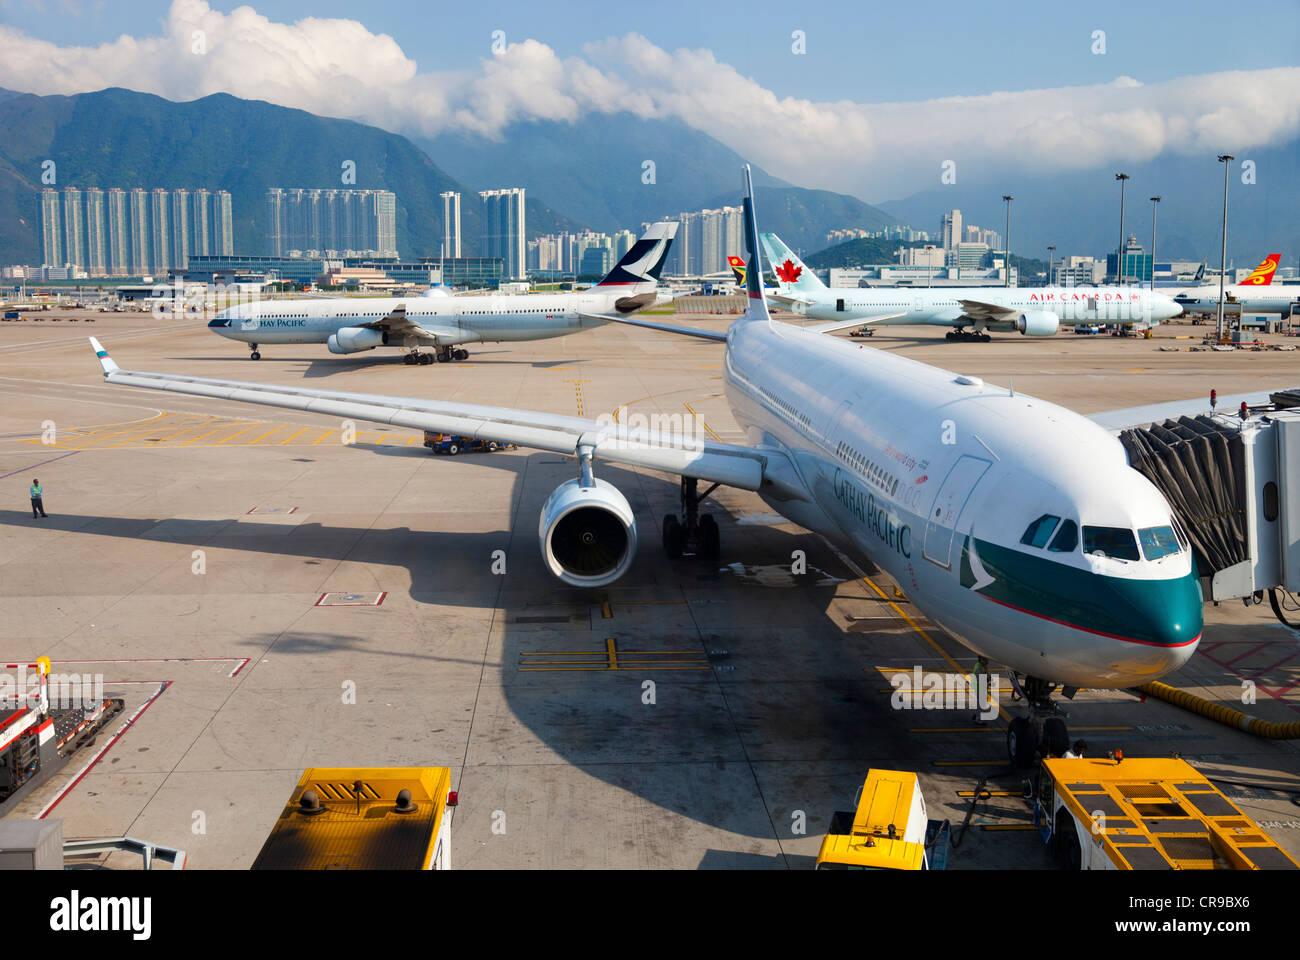 Hong Kong's Chek Lap Kok Airport - Stock Image